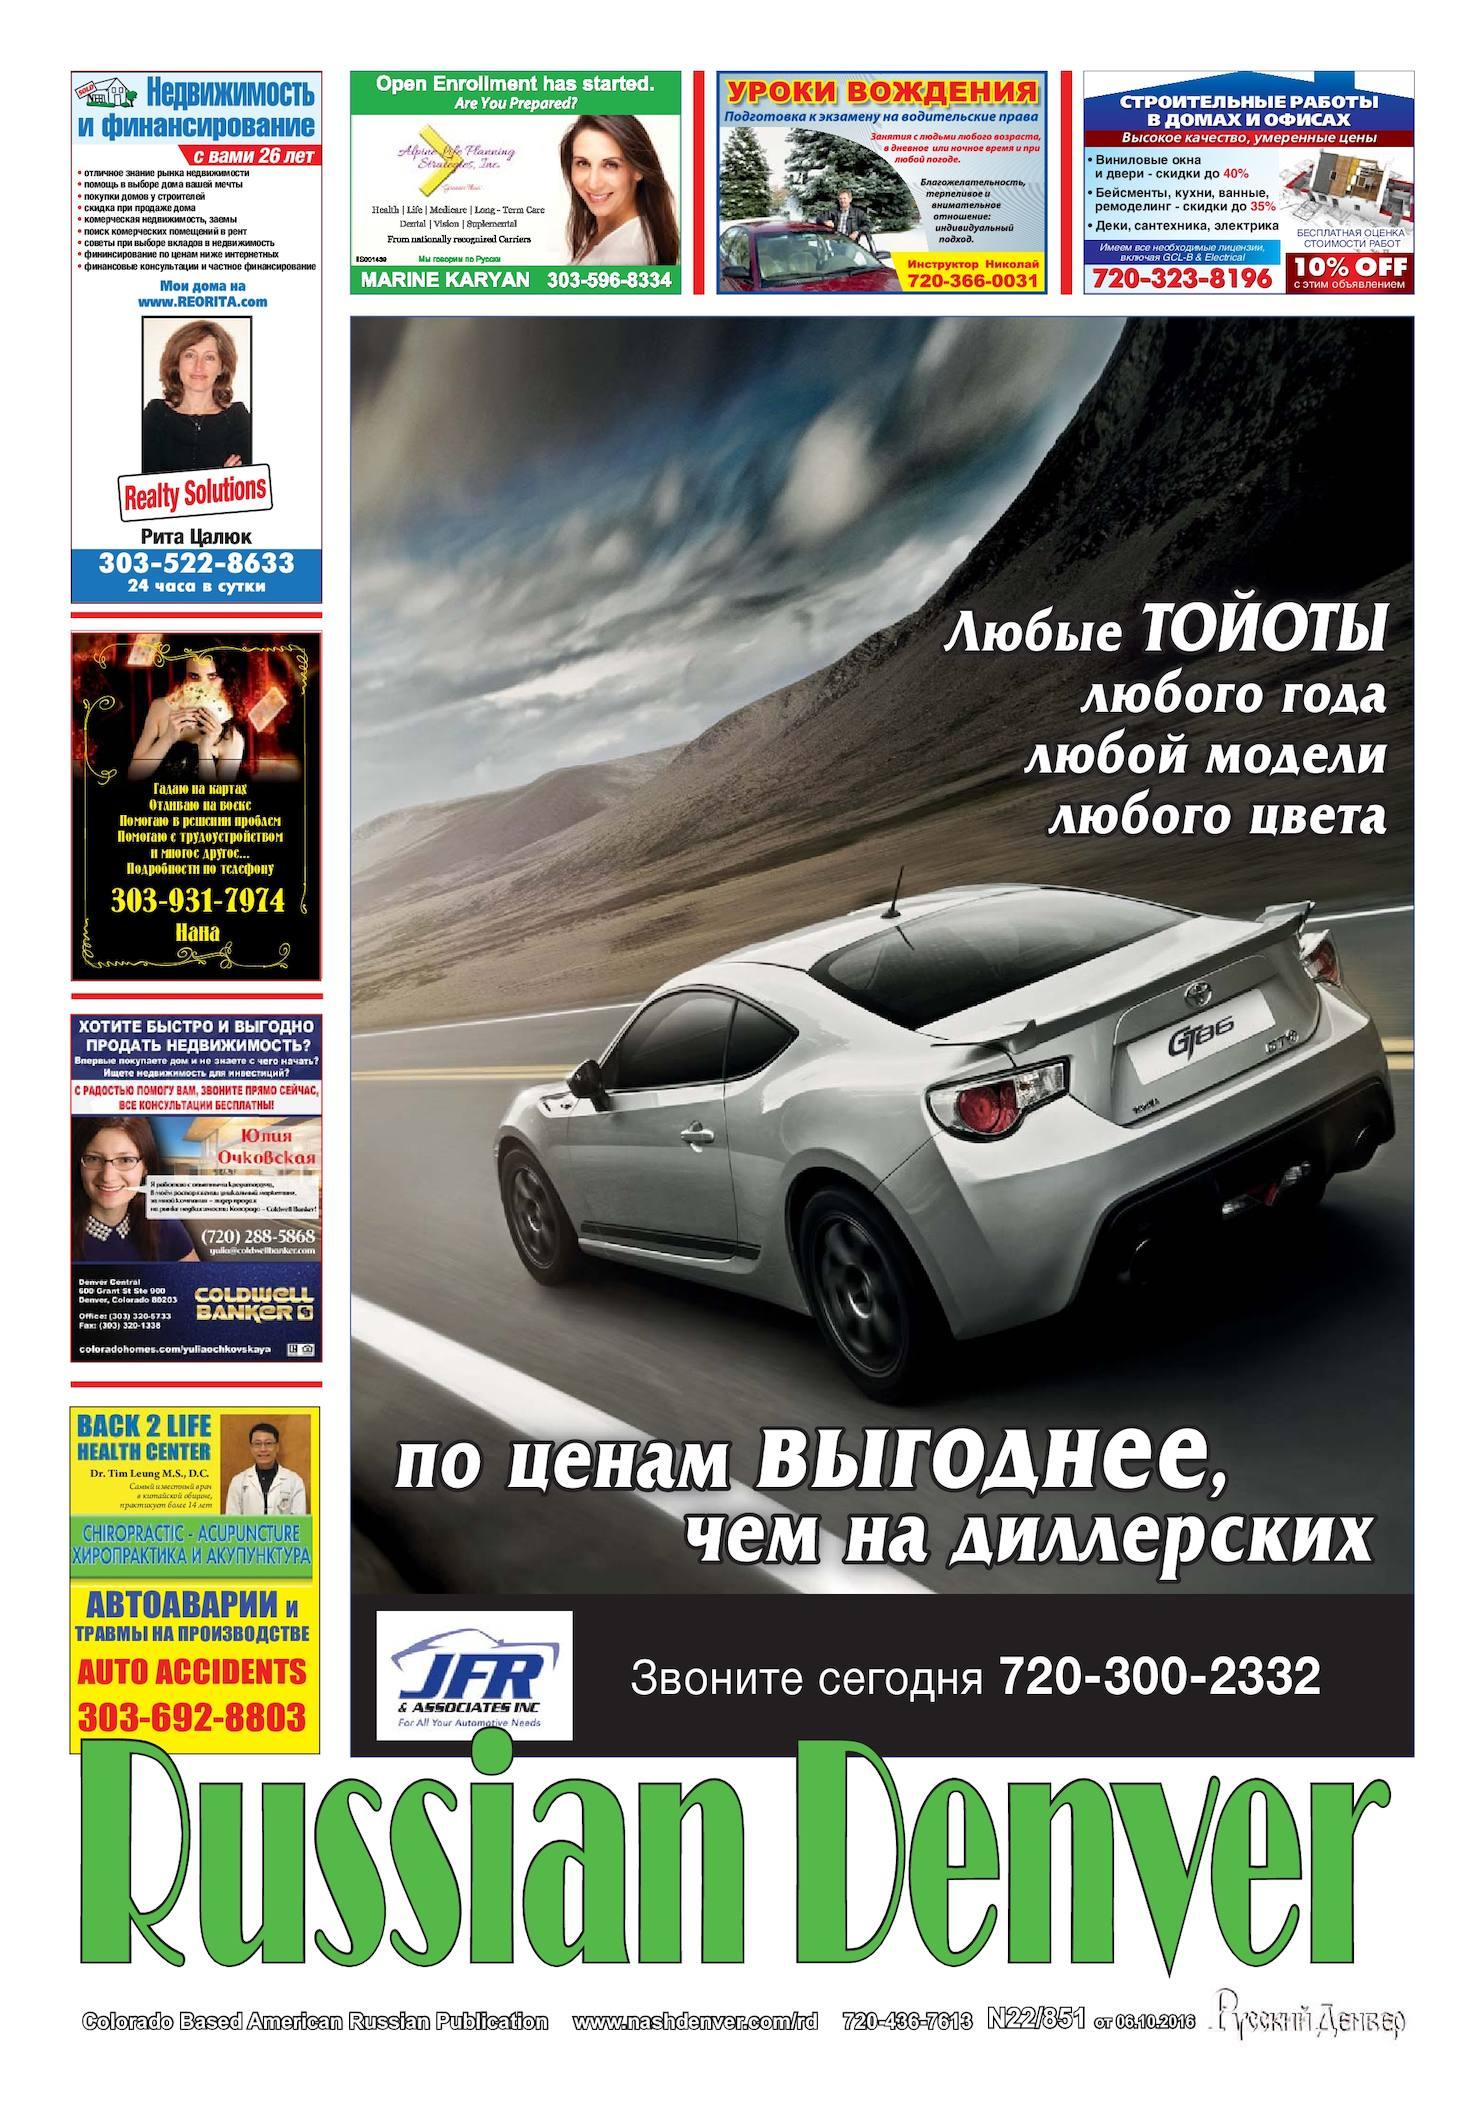 Calaméo - Russian Denver N22 851 553138b2dbd